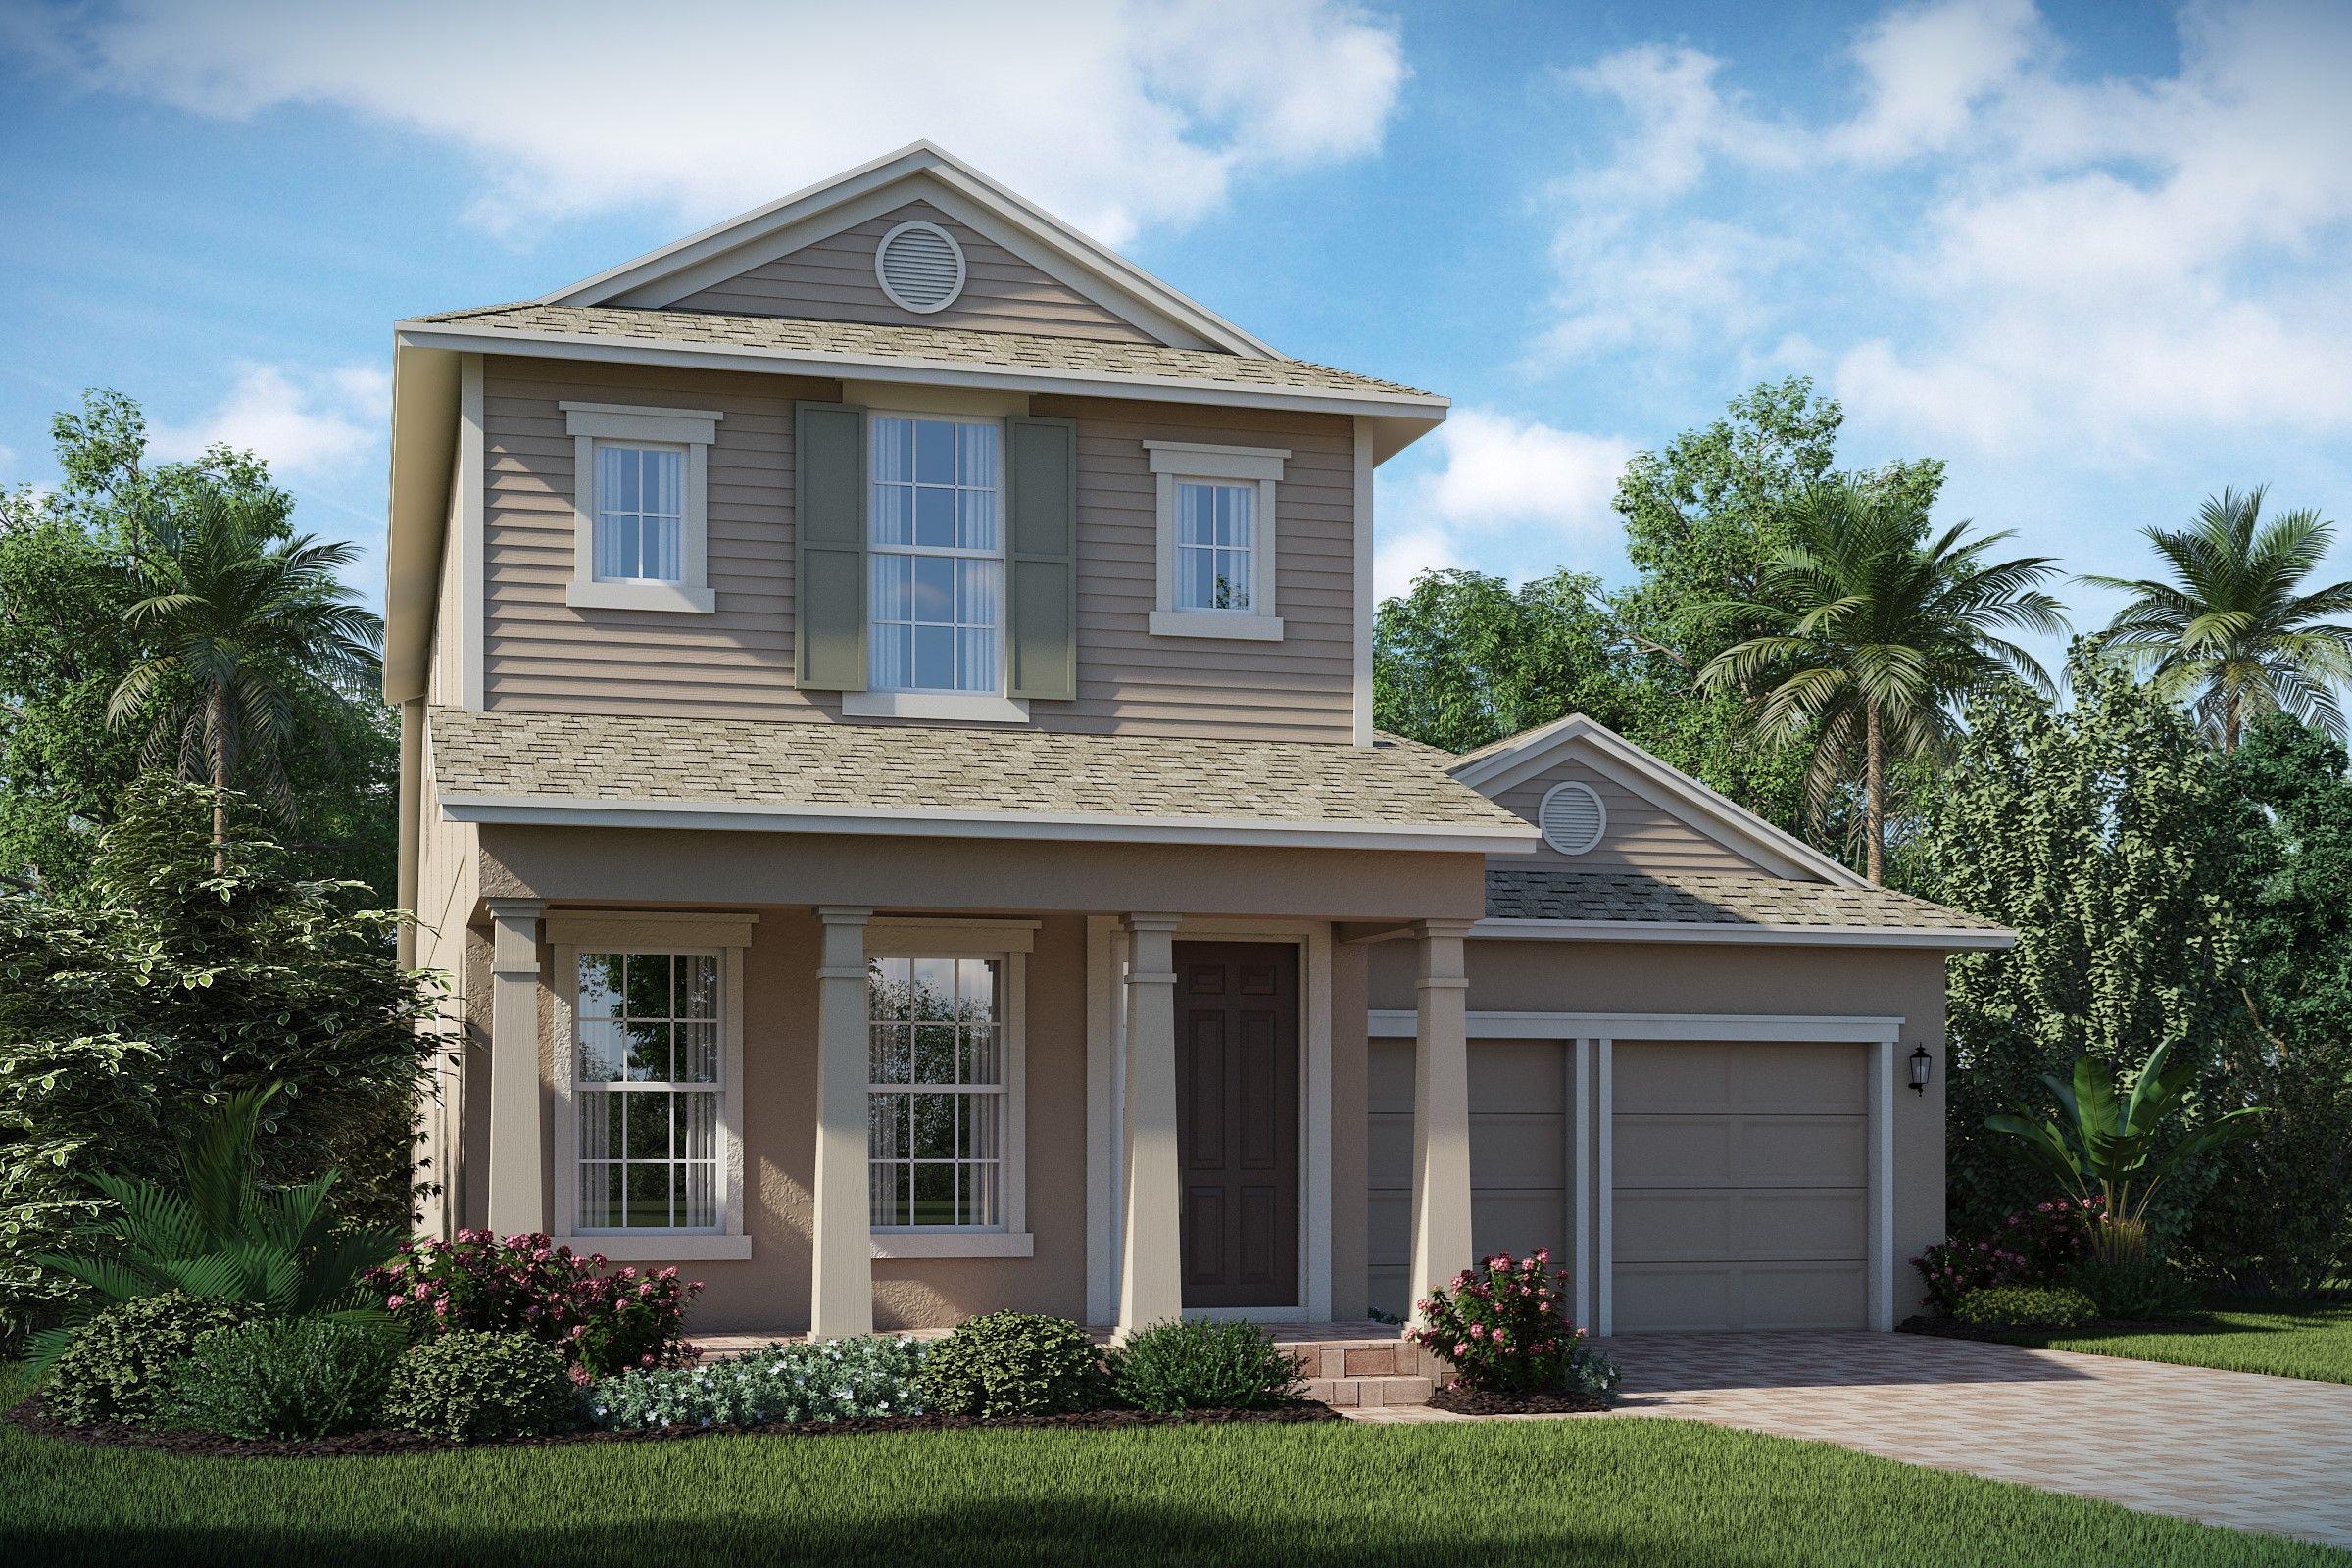 15496 Sweet Orange Avenue Homesite 121 Winter Garden Fl 34787 New Home In The Highlands At